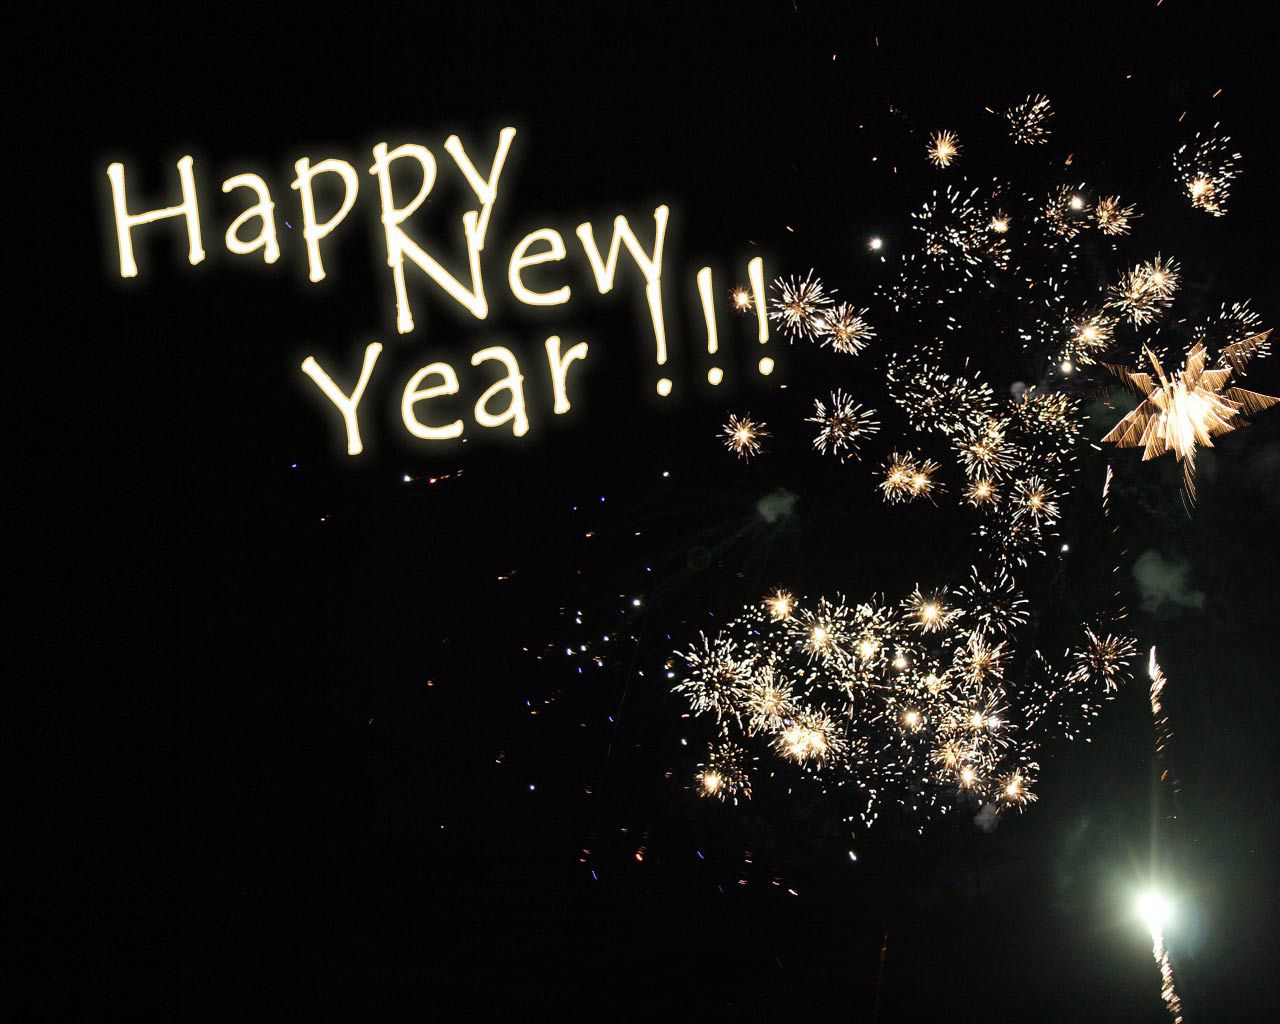 Happy New Year HD Wallpapers  Elsoar